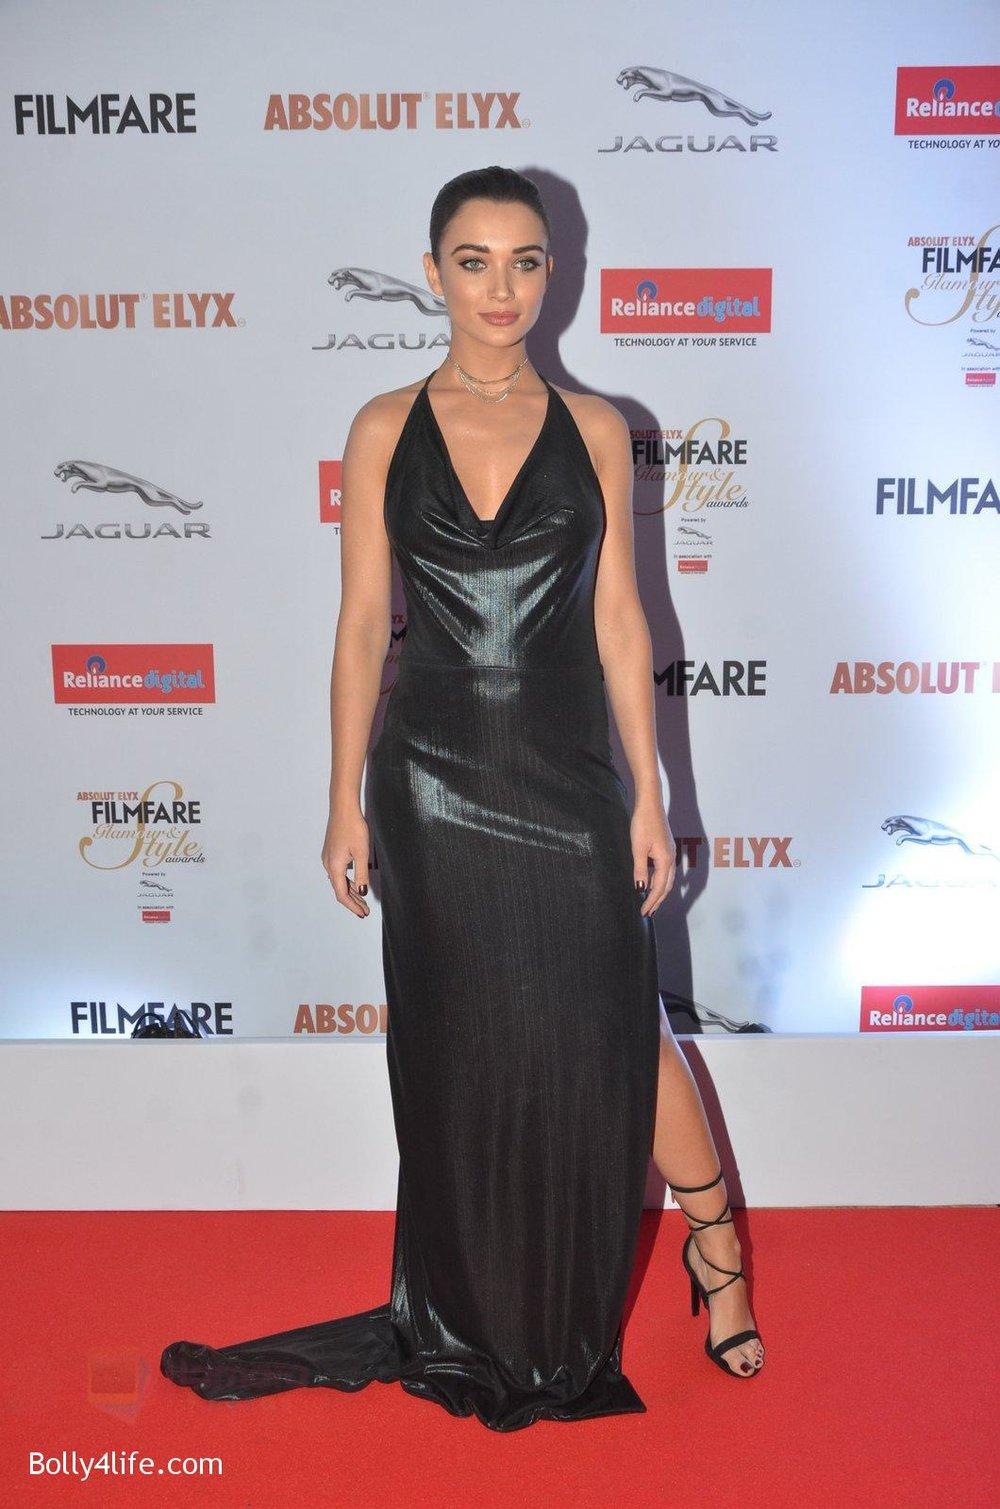 Amy-Jackson-at-Filmfare-Glamour-Style-Awards-2016-in-Mumbai-on-15th-Oct-2016-1429.jpg